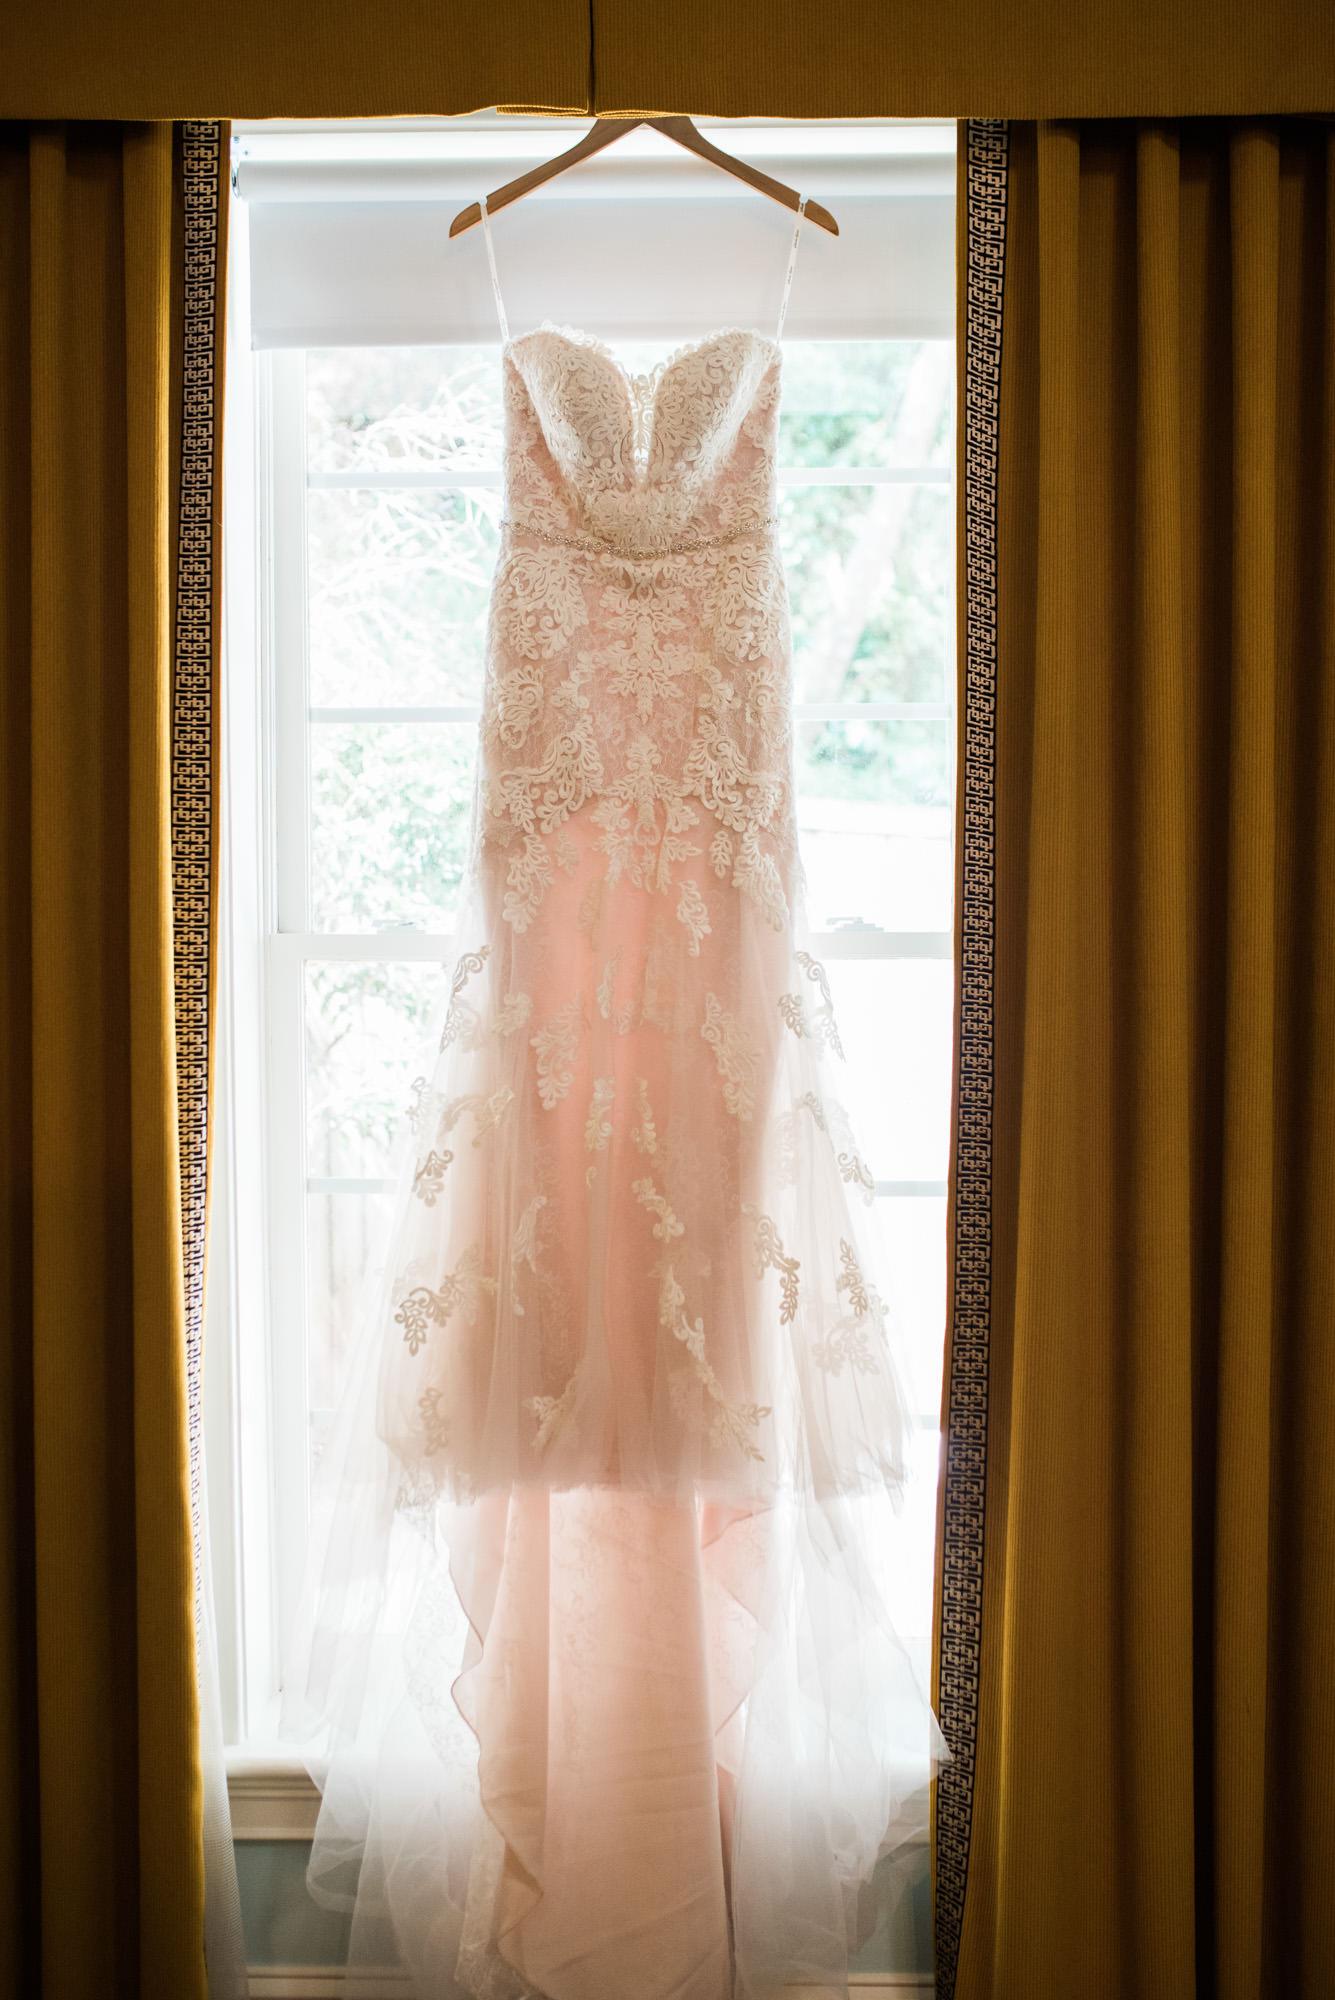 Athens-wedding-dress-2.jpg